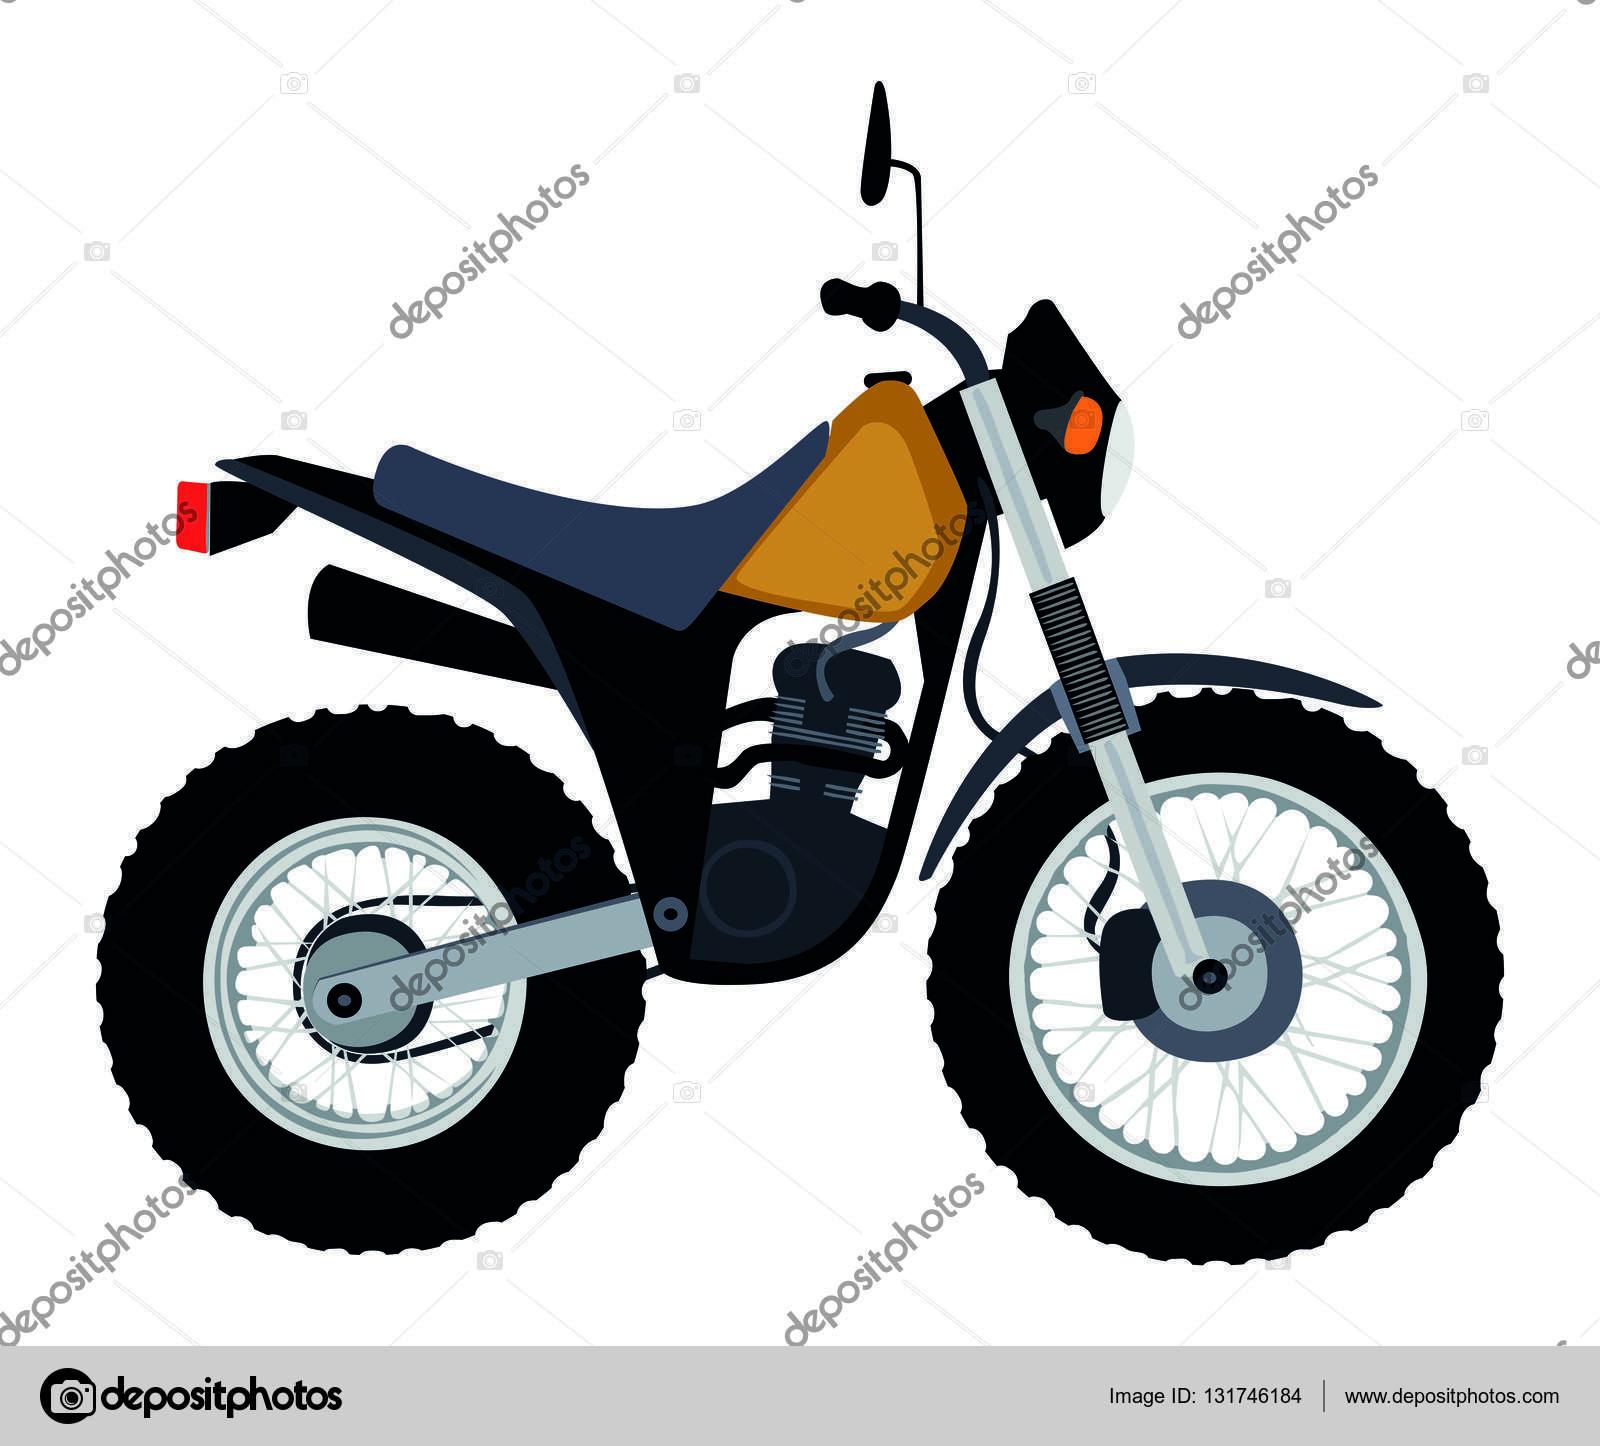 Yamaha clipart dirt bike Yamaha — Vector TW #131746184